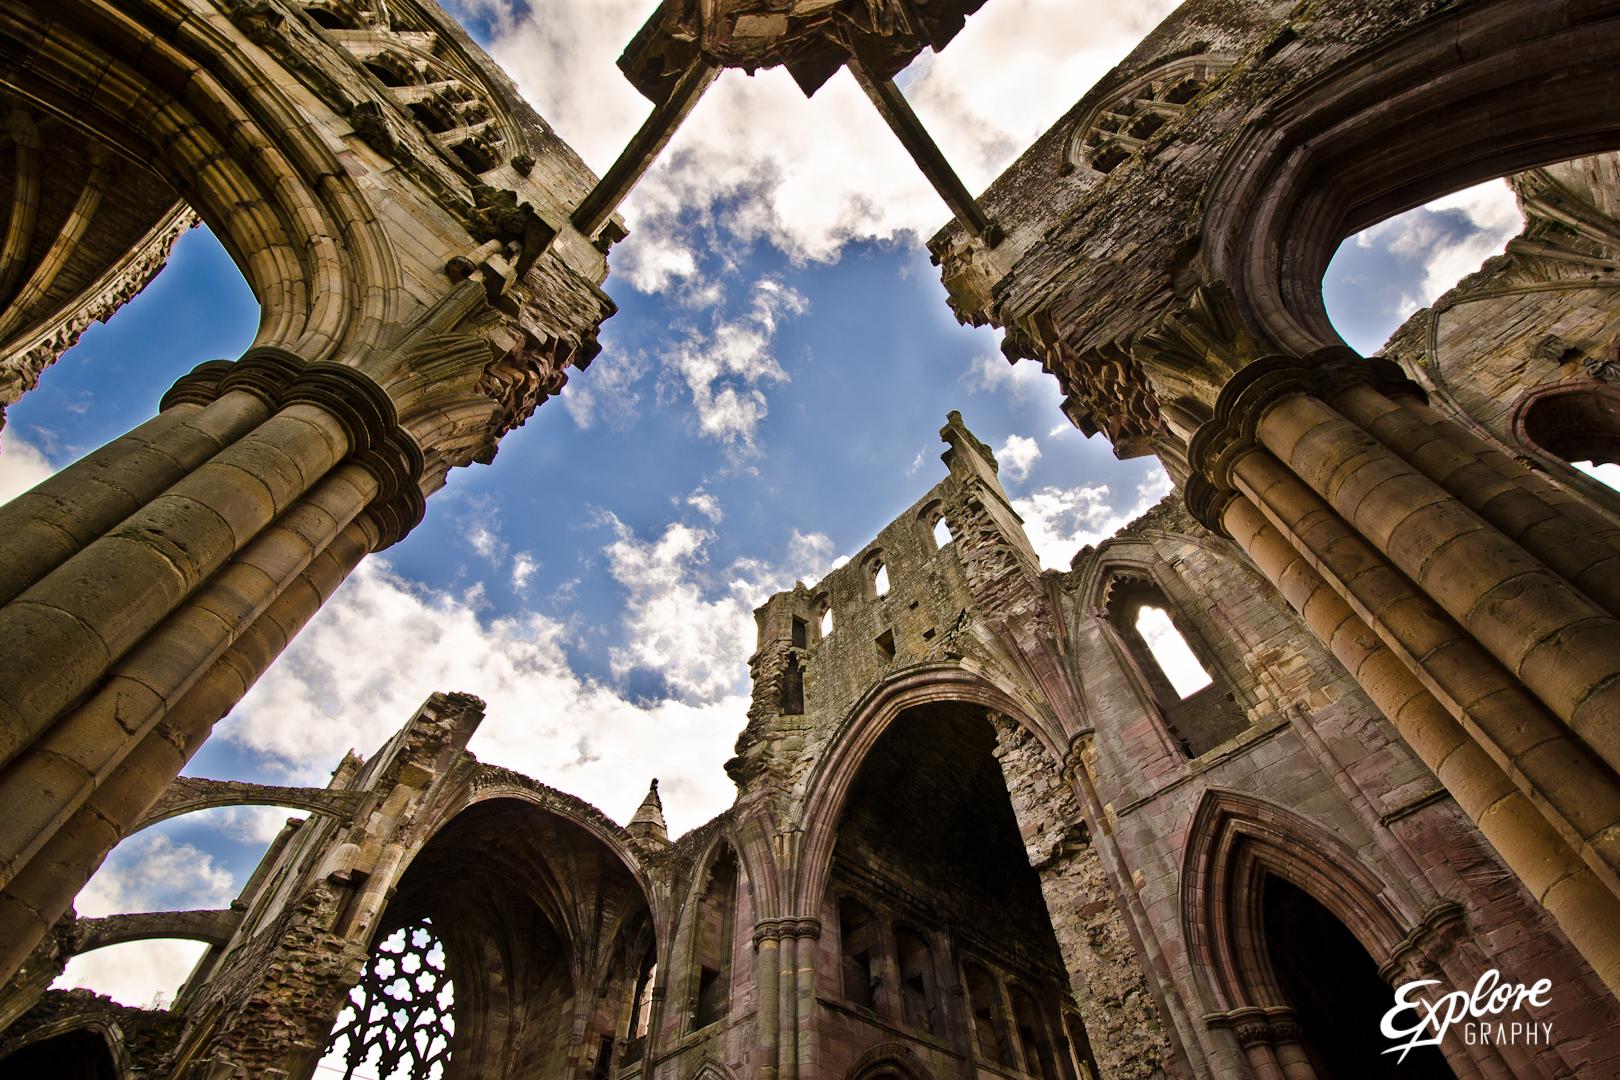 2015-08-04_hagen-hoppe-fotografie_travel_scotland_190